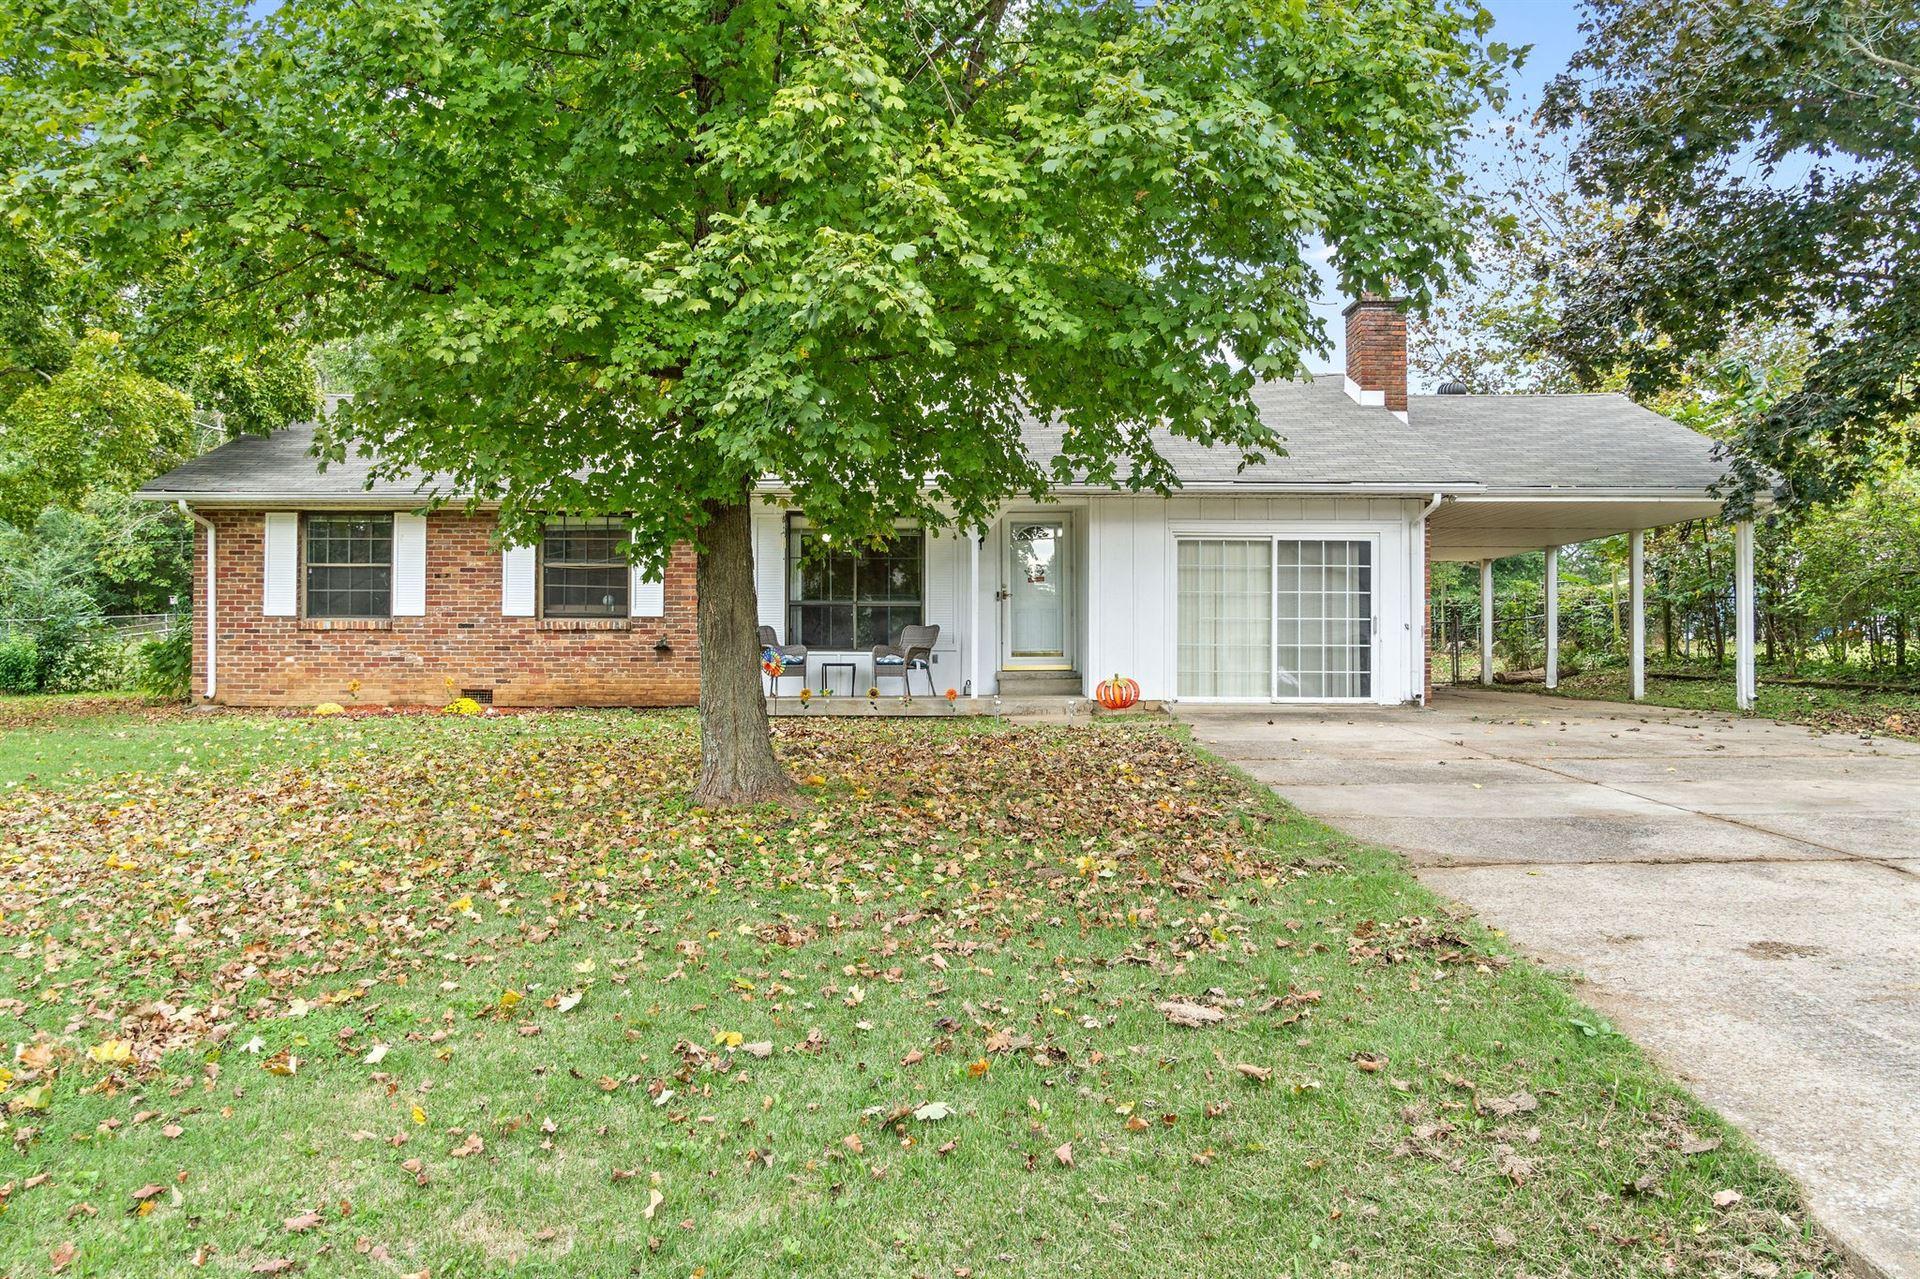 573 Magnolia Dr, Clarksville, TN 37042 - MLS#: 2300241